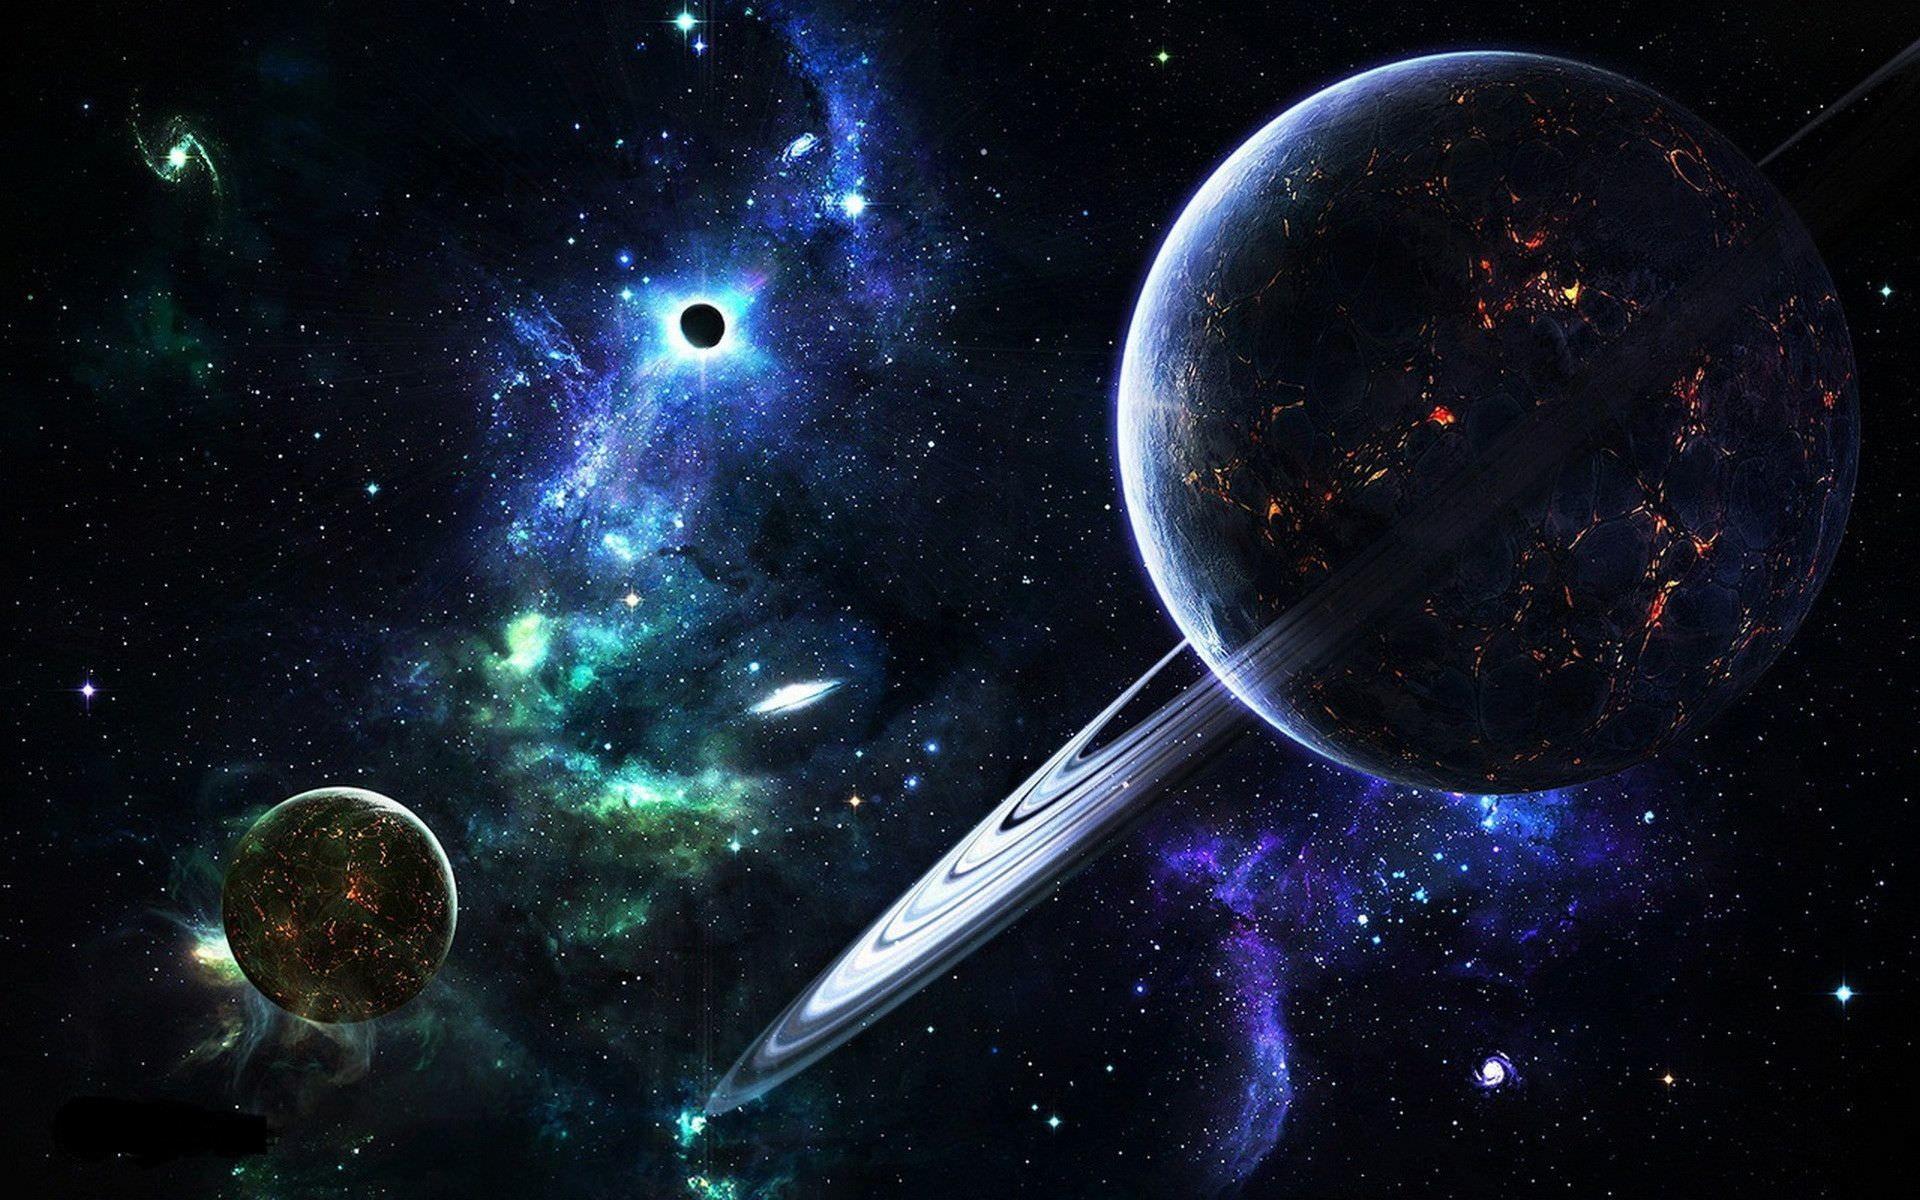 Sci Fi HD Space Wallpaper